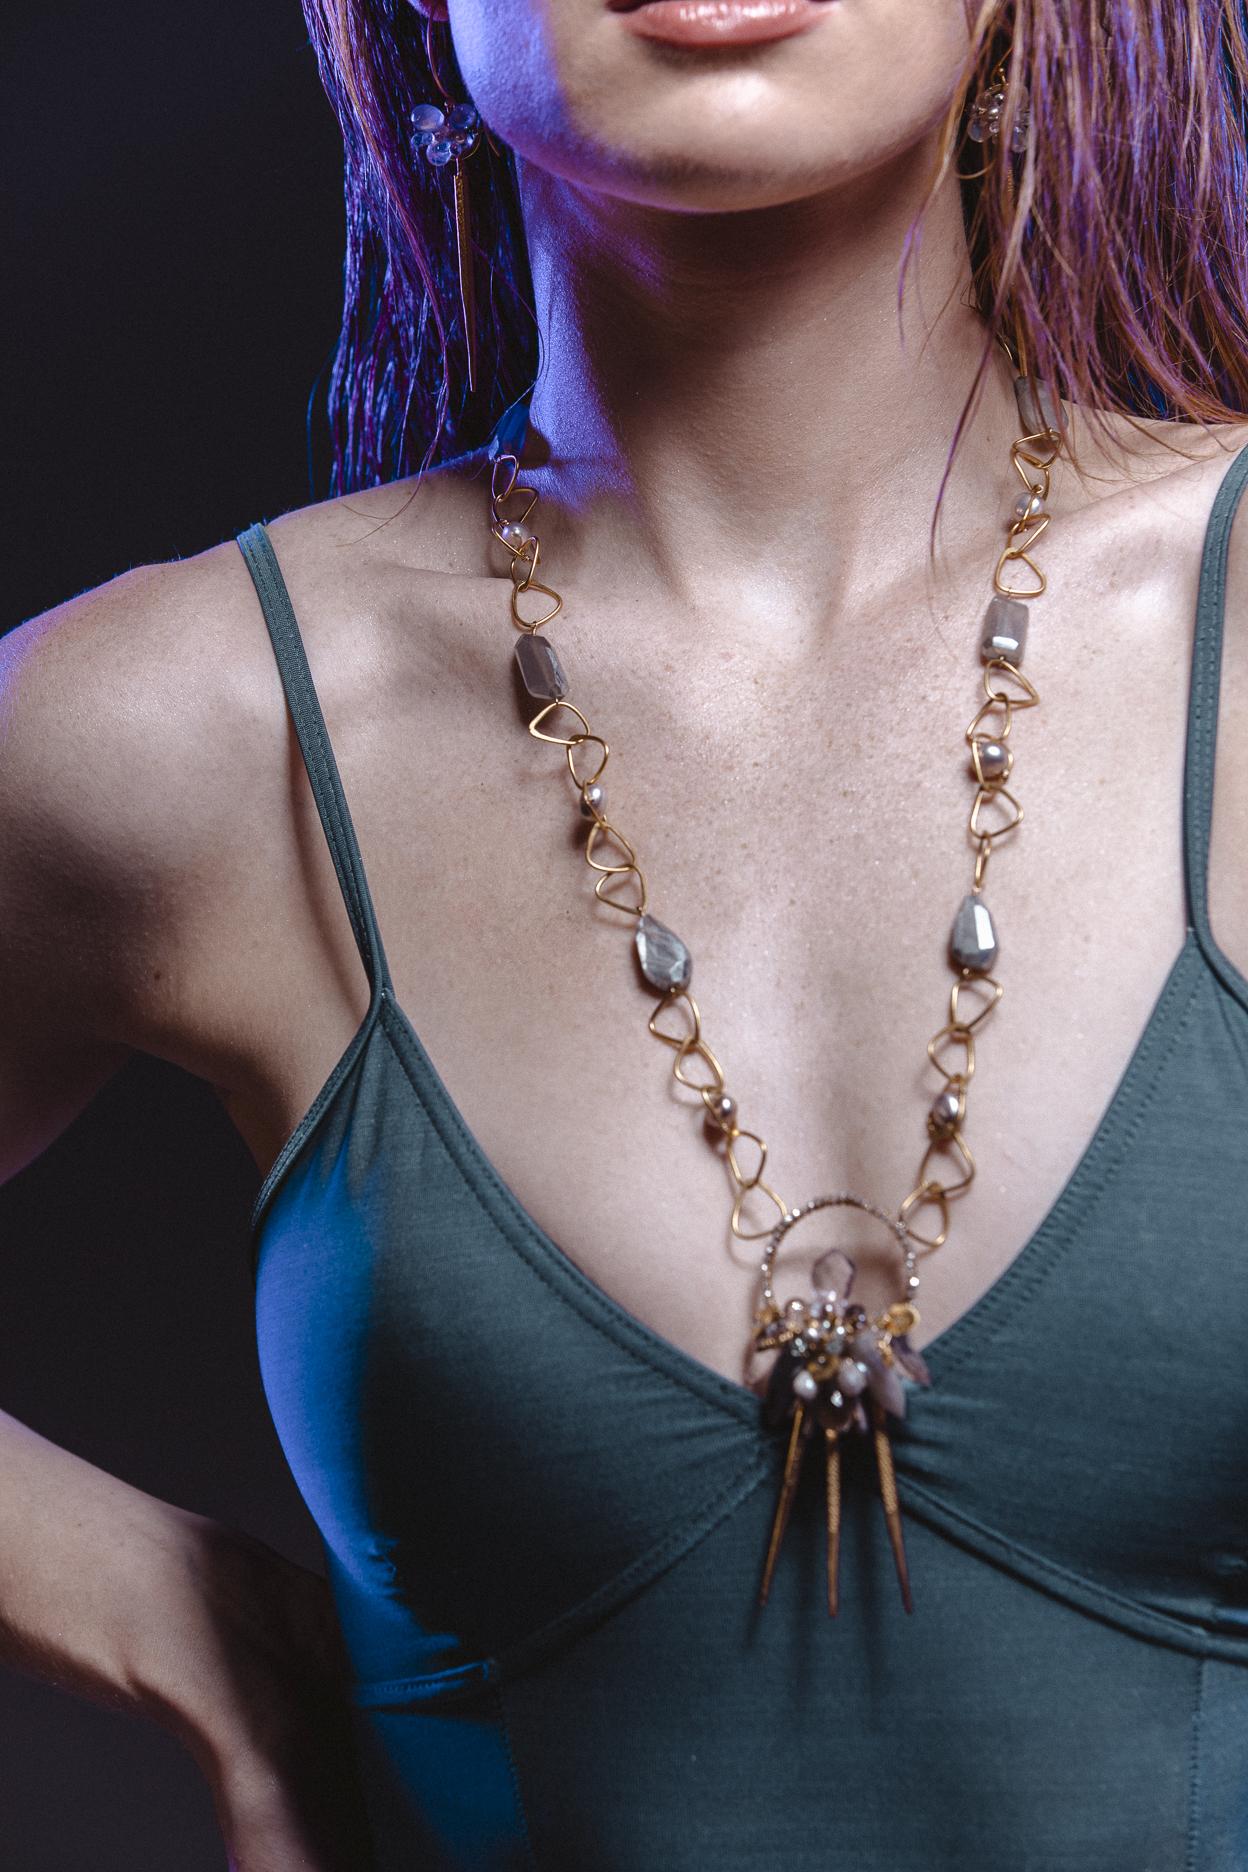 Model wearing long gemstone pendant necklace